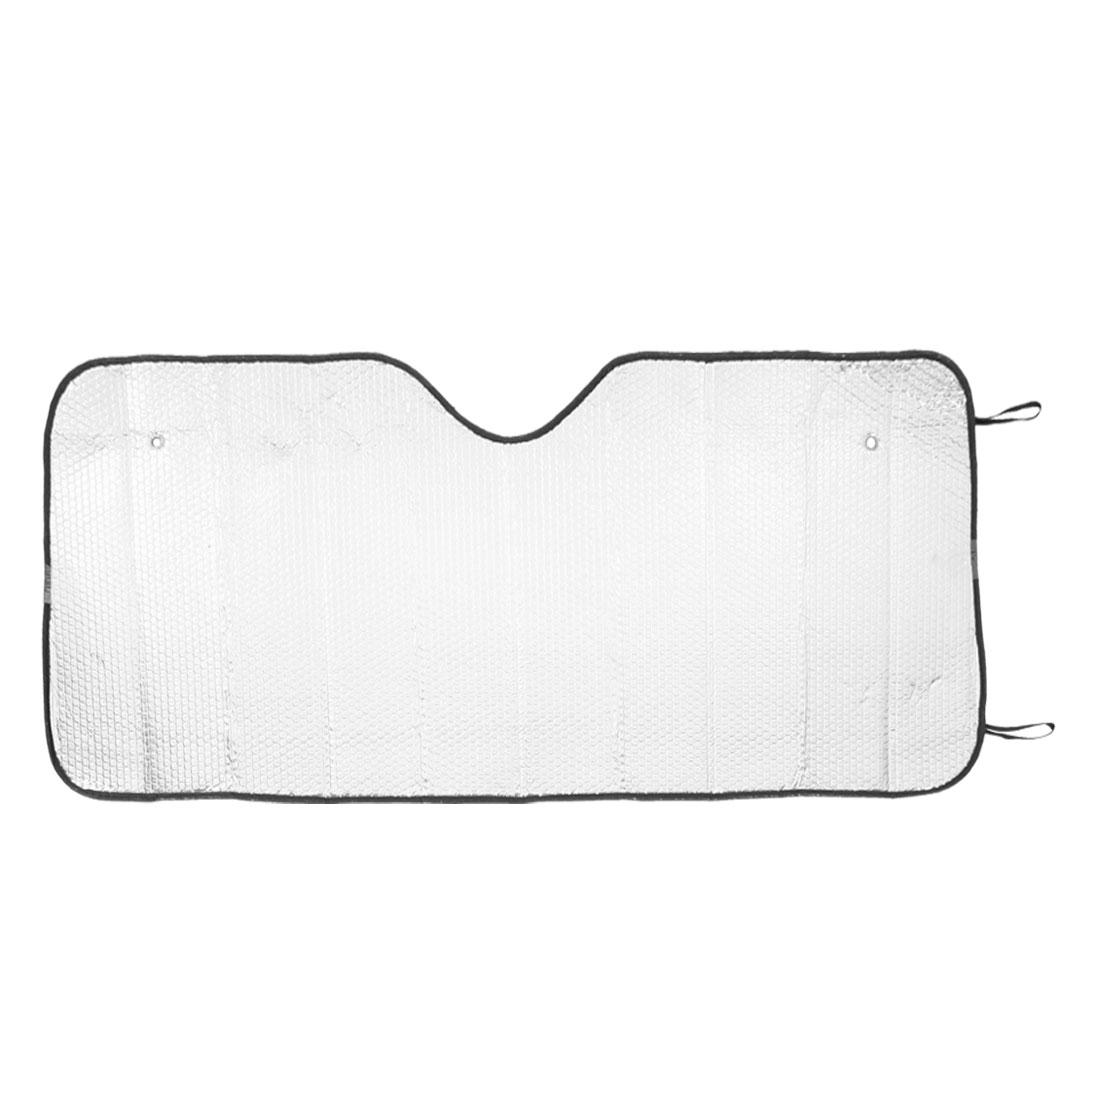 "50"" x 24"" Car Rear Window Reflective Bubble Aluminum Foil Sunshade"